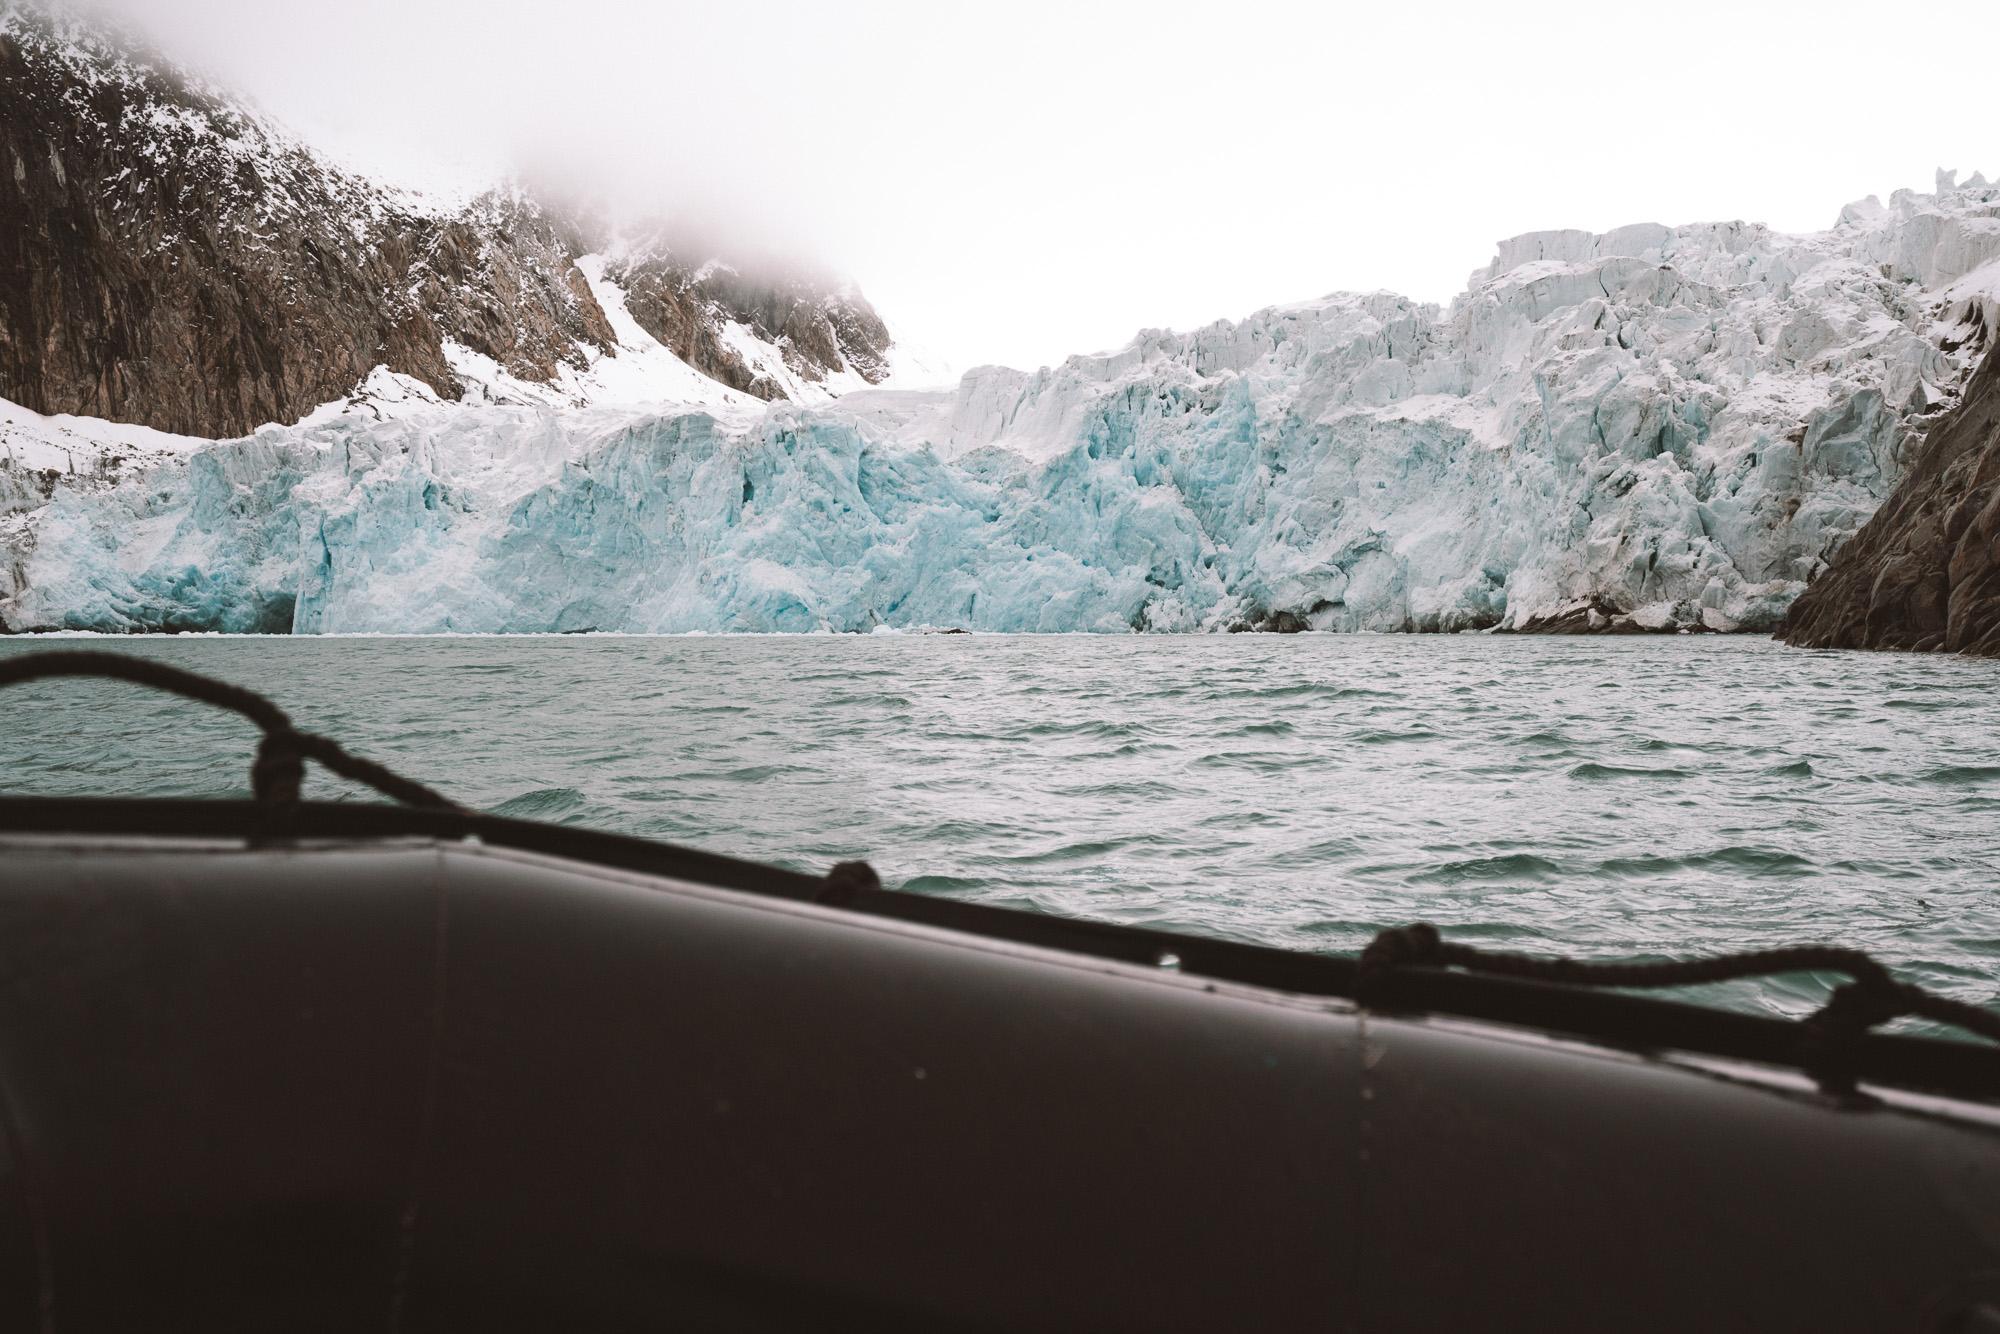 Hamilton Bukta glaciers in Svalbard Spitsbergen from our zodiac